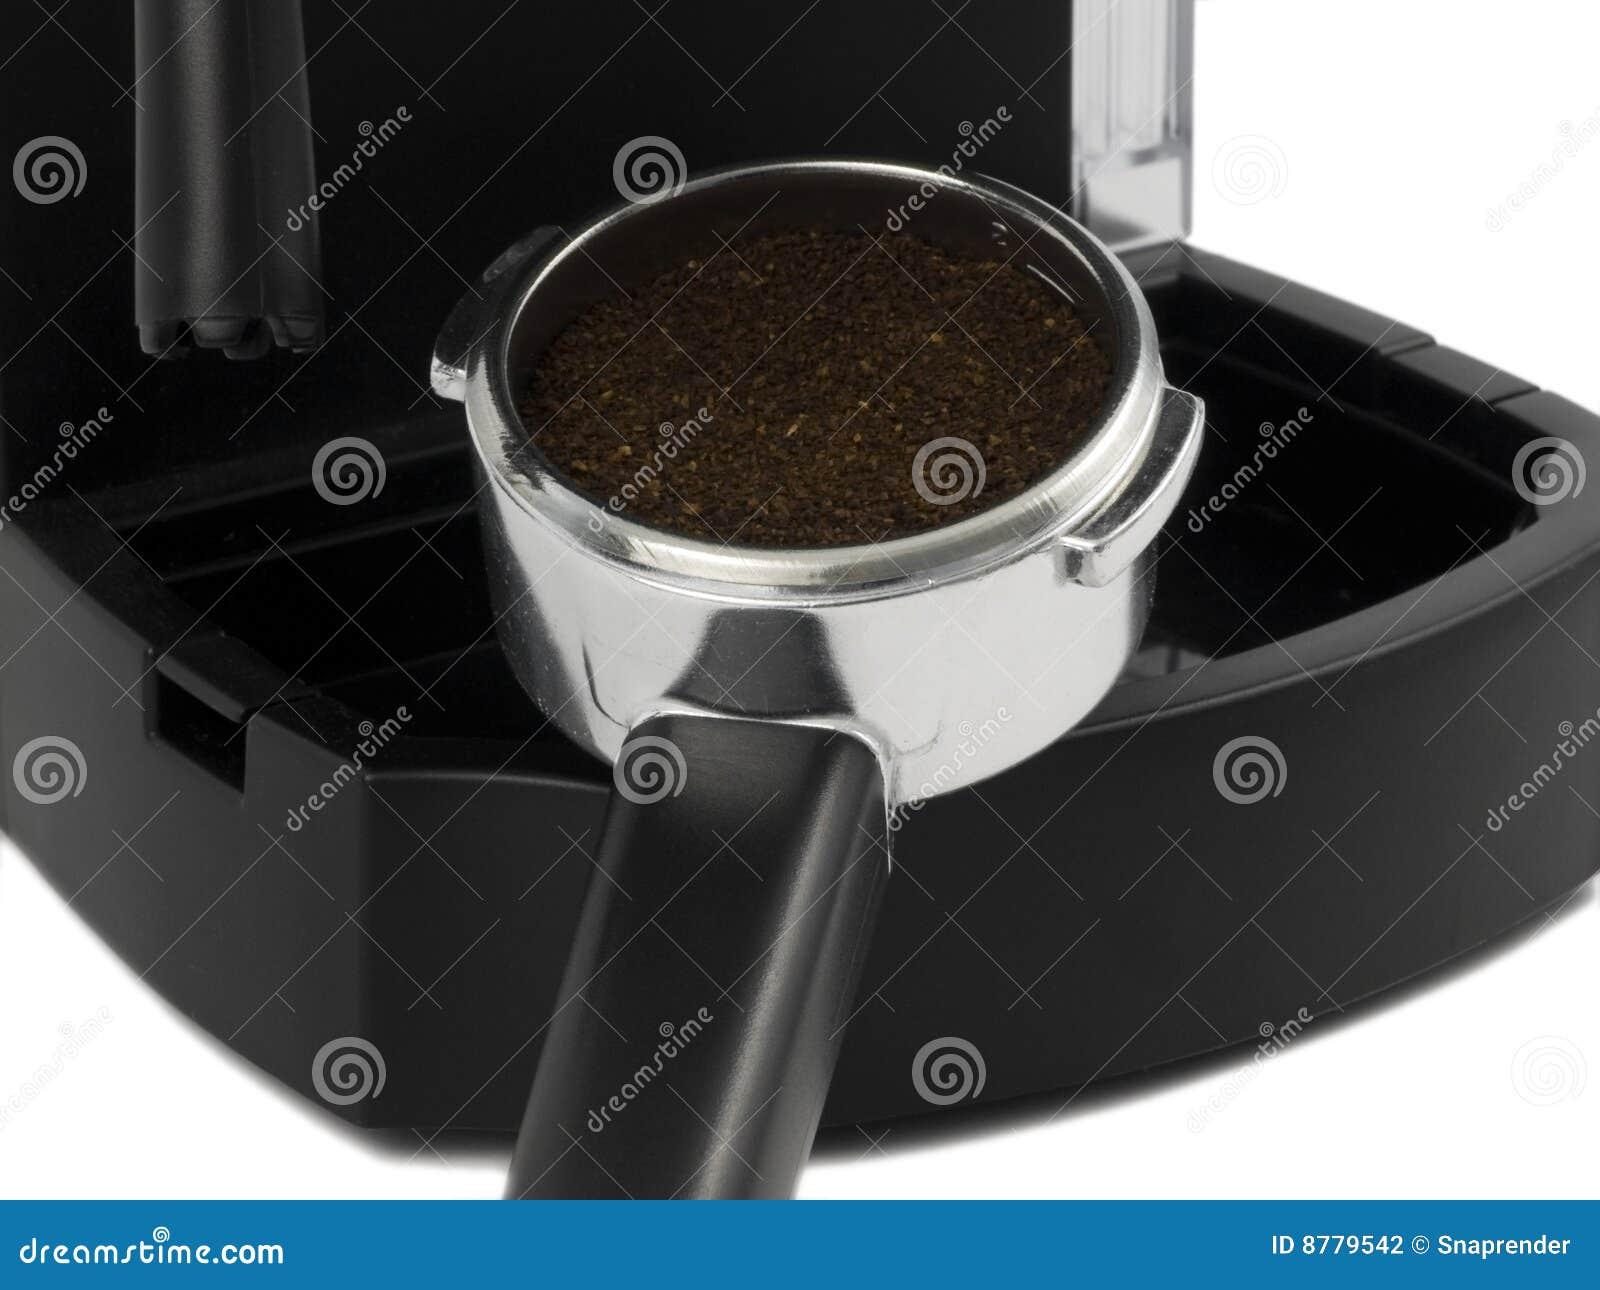 Espresso Filter Holder ~ Espresso grounds in filter holder stock photography